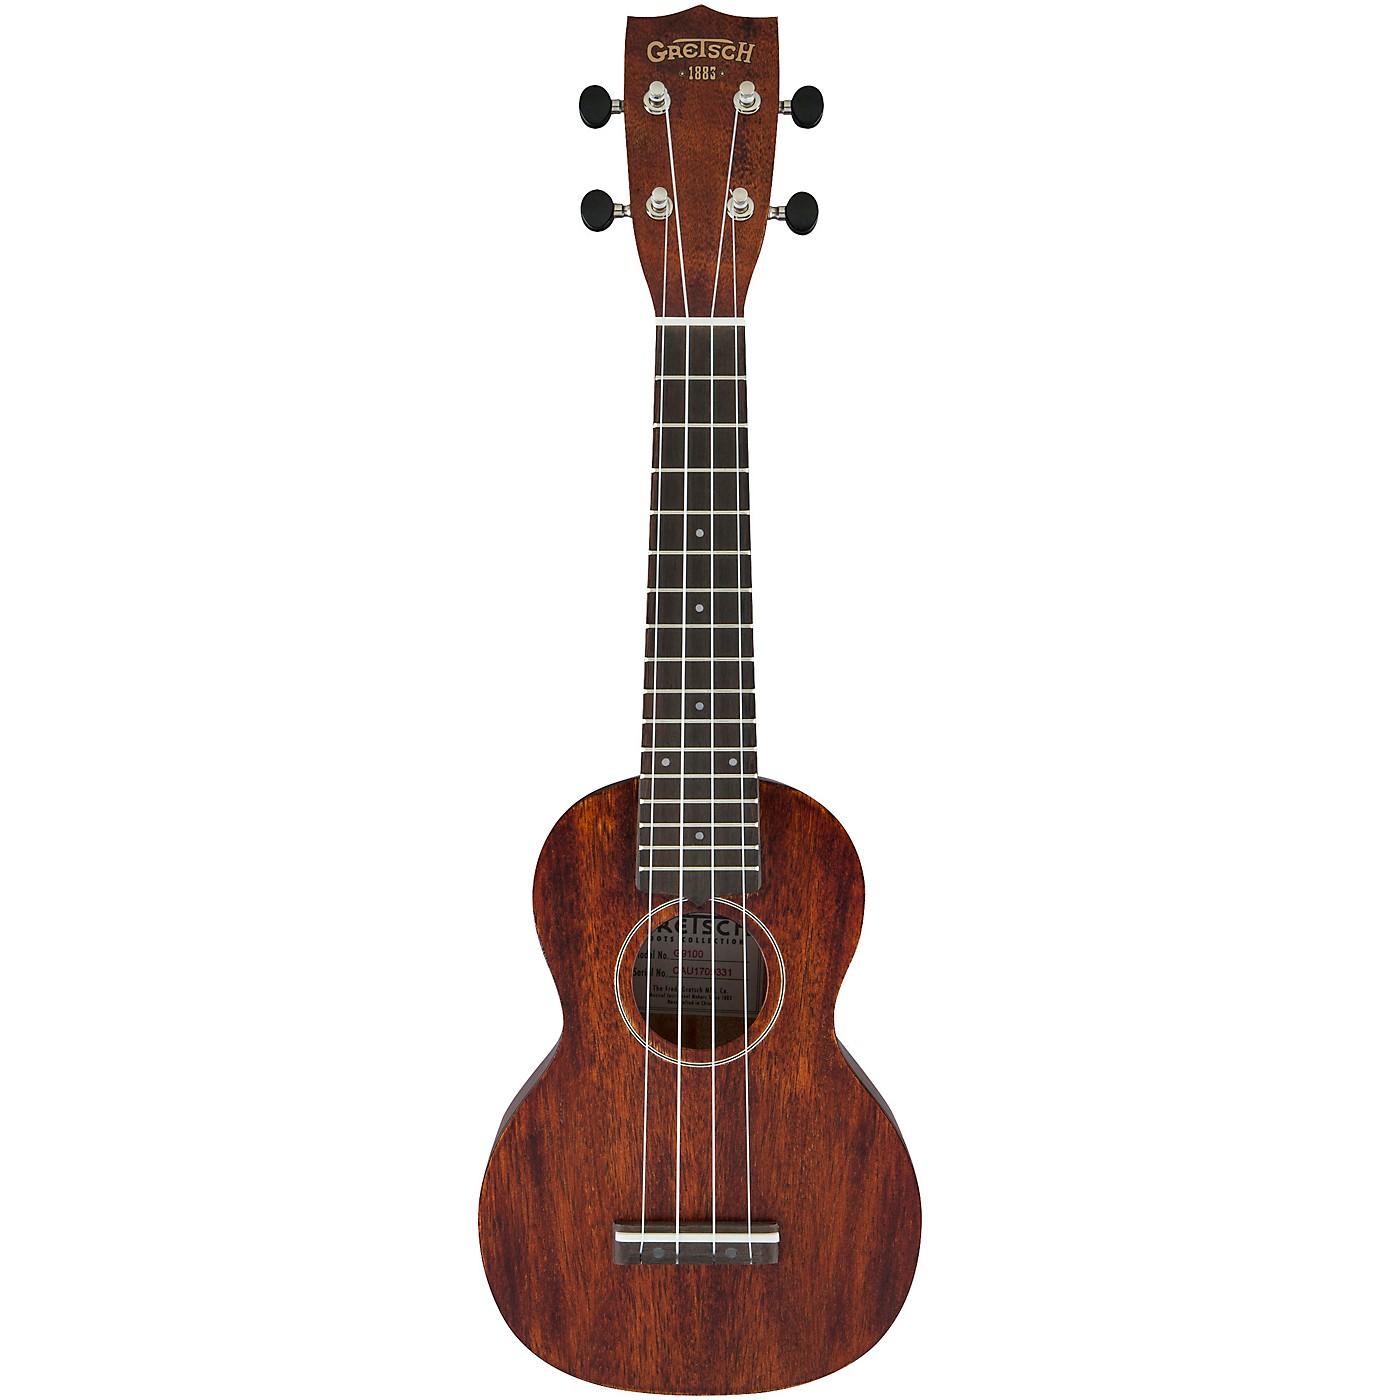 Gretsch Guitars G9100 Soprano Standard Ukulele with Ovangkol Fingerboard thumbnail